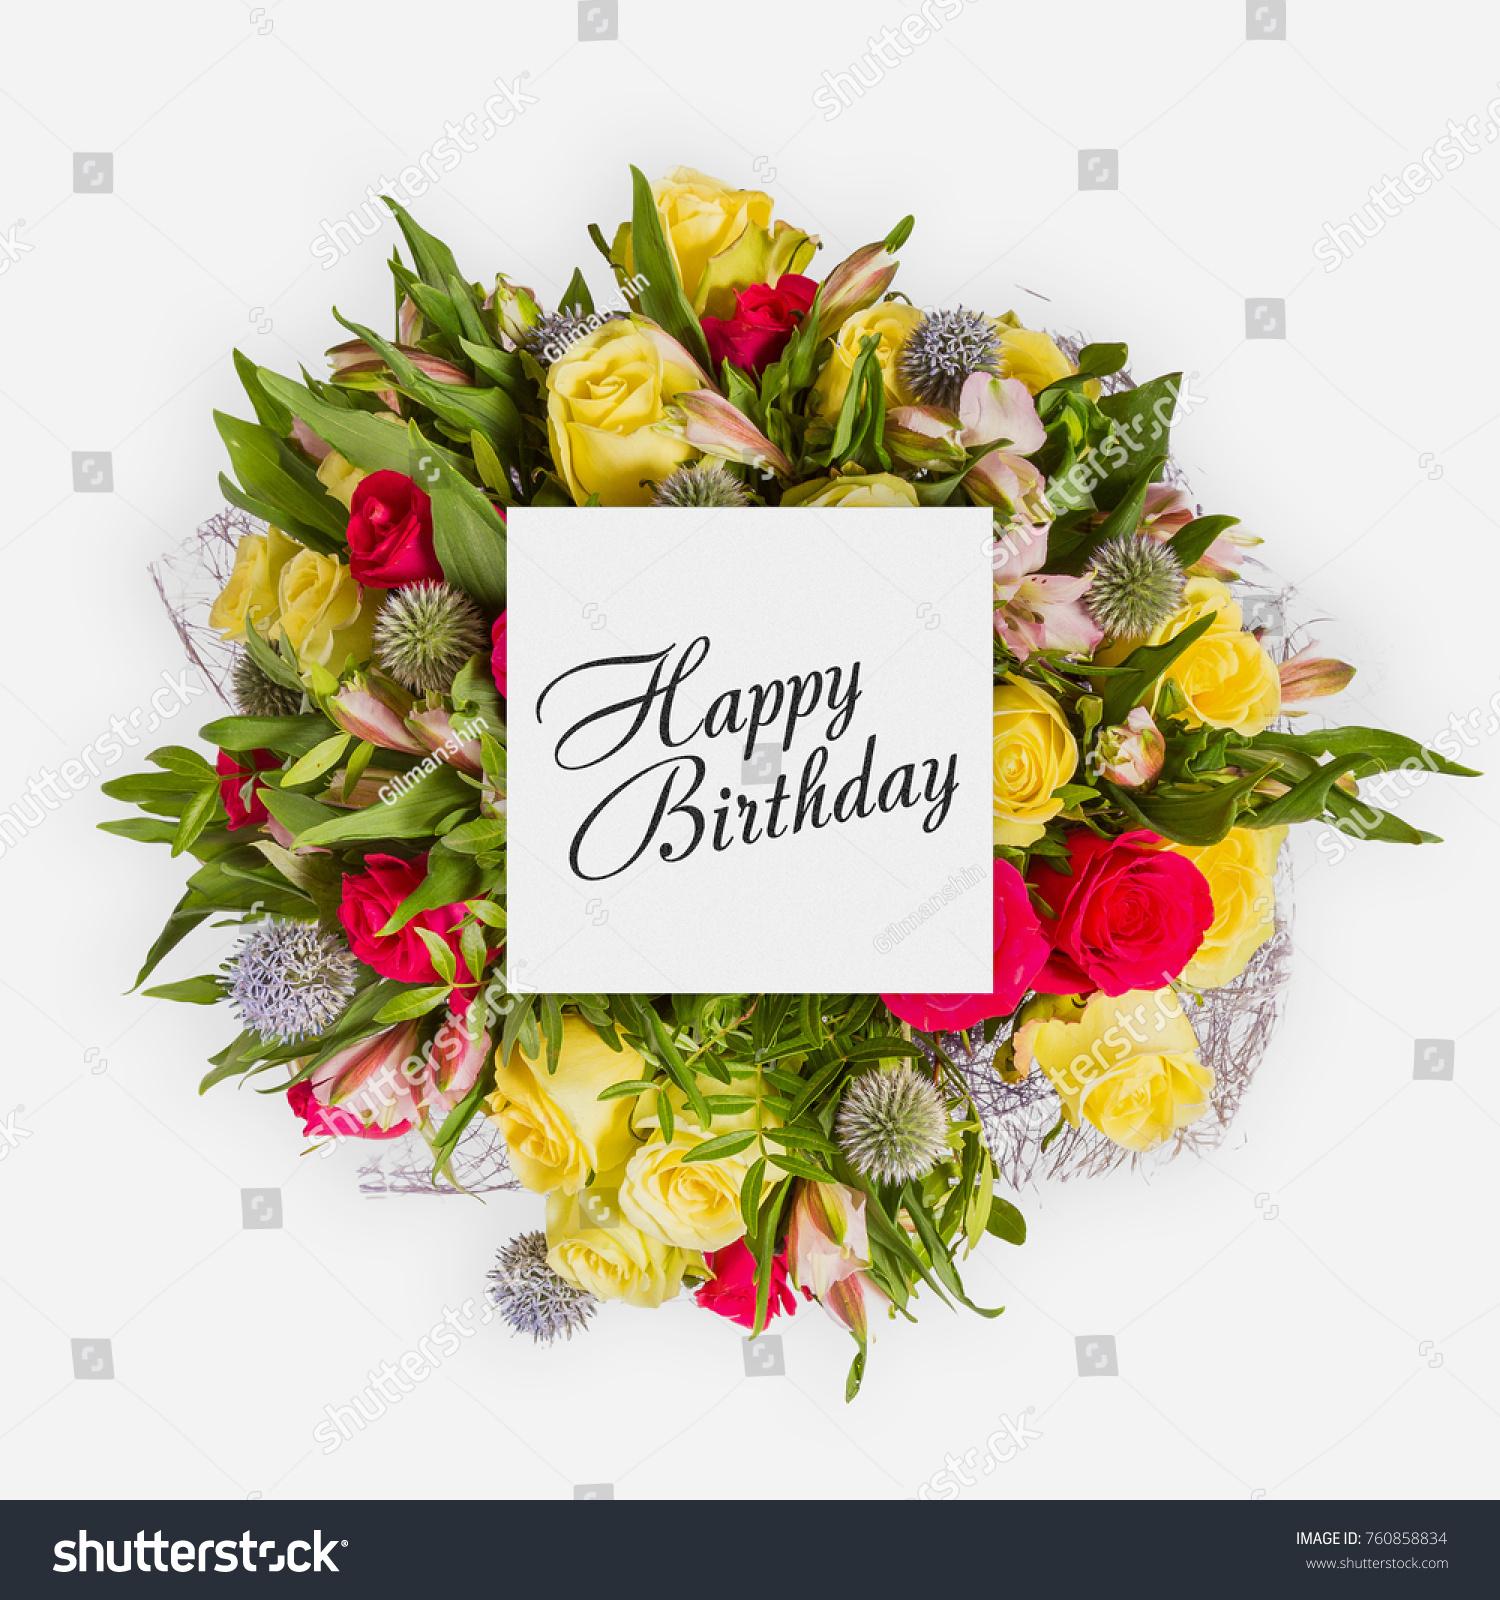 Happy birthday card flowers flat lay stock photo 760858834 happy birthday card with flowers flat lay kristyandbryce Gallery